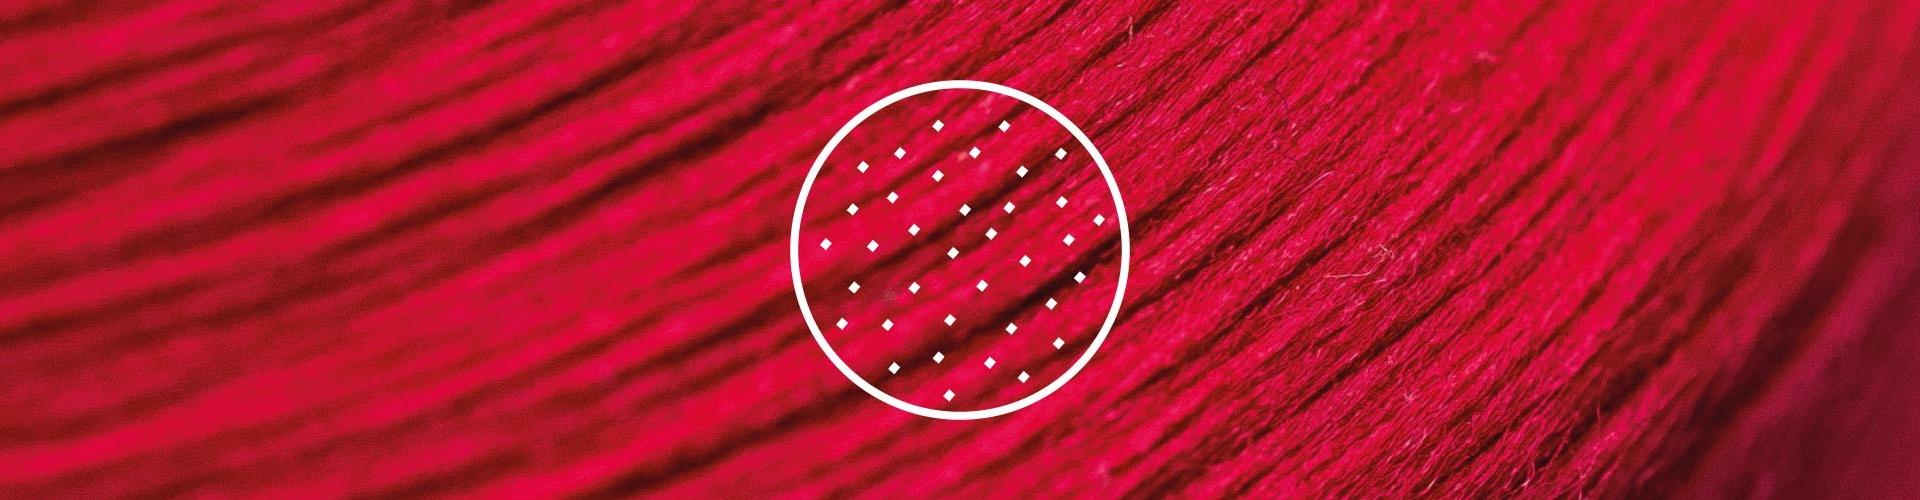 microfibre yarn